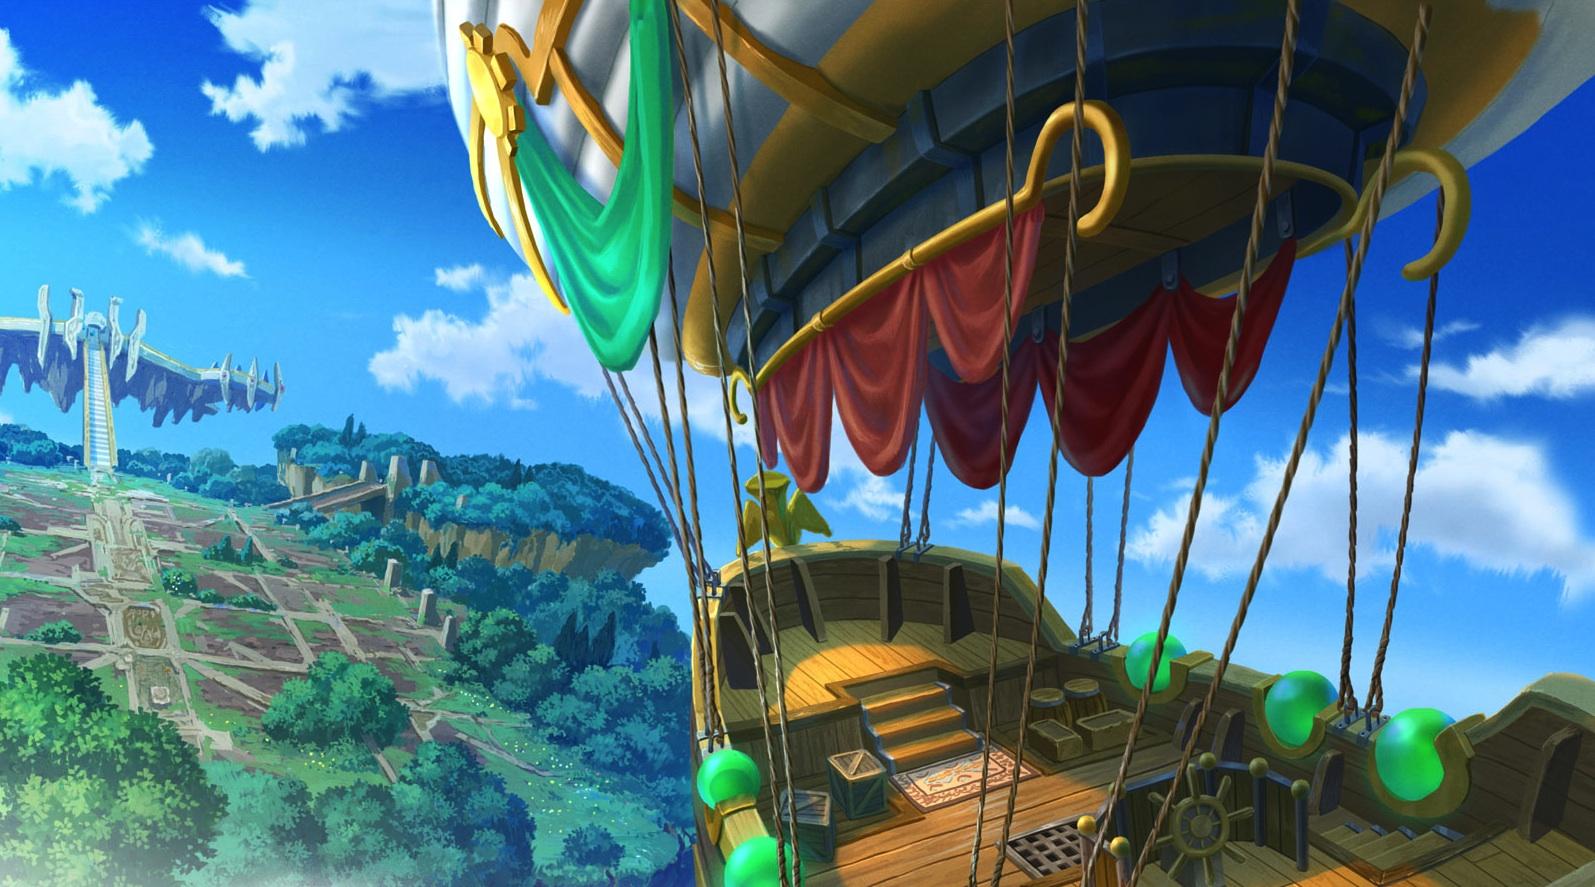 Airship_sky_wide